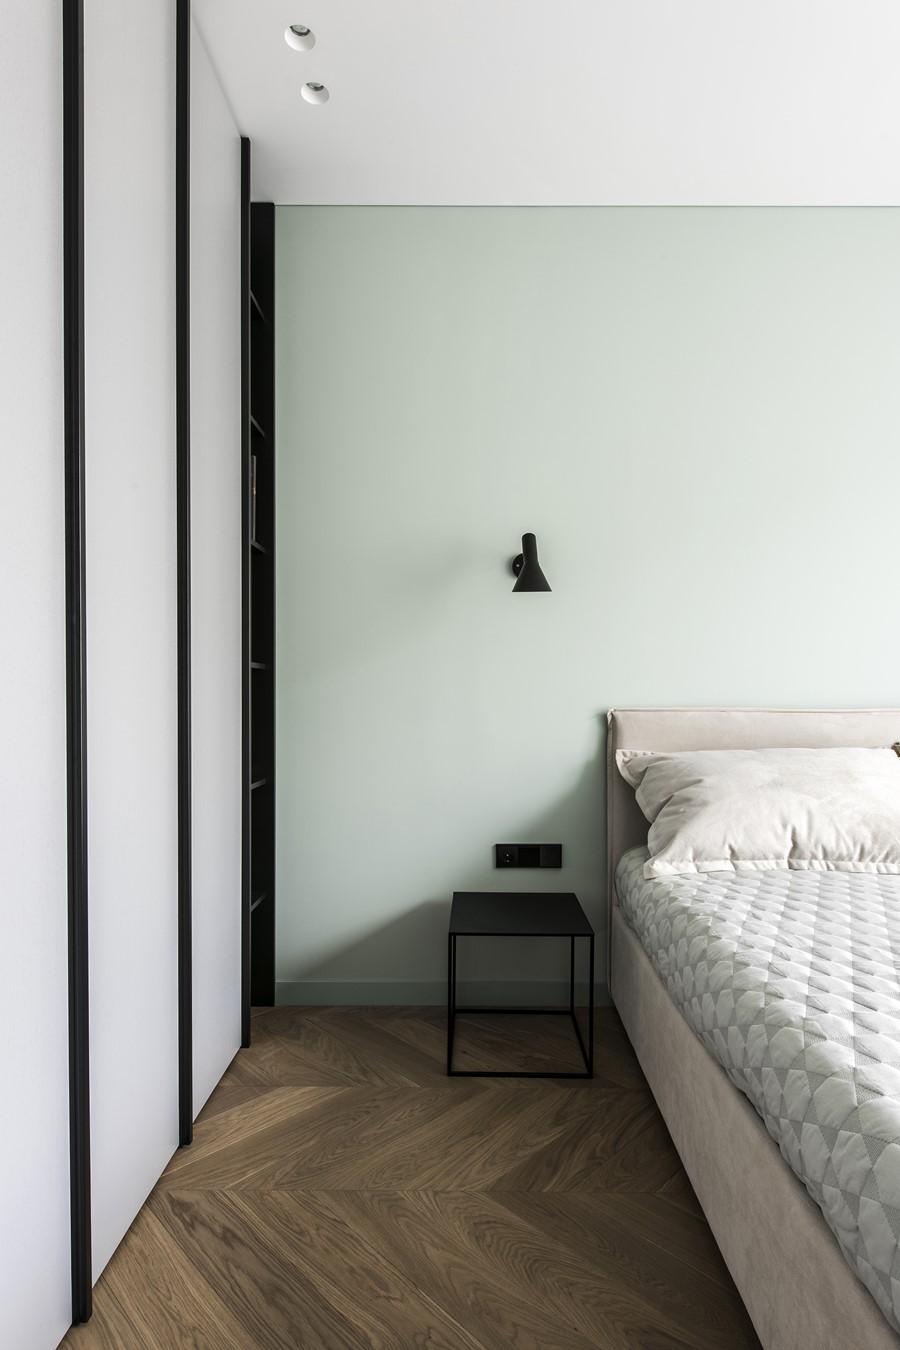 interior-design-by-normundas-vilkas-09